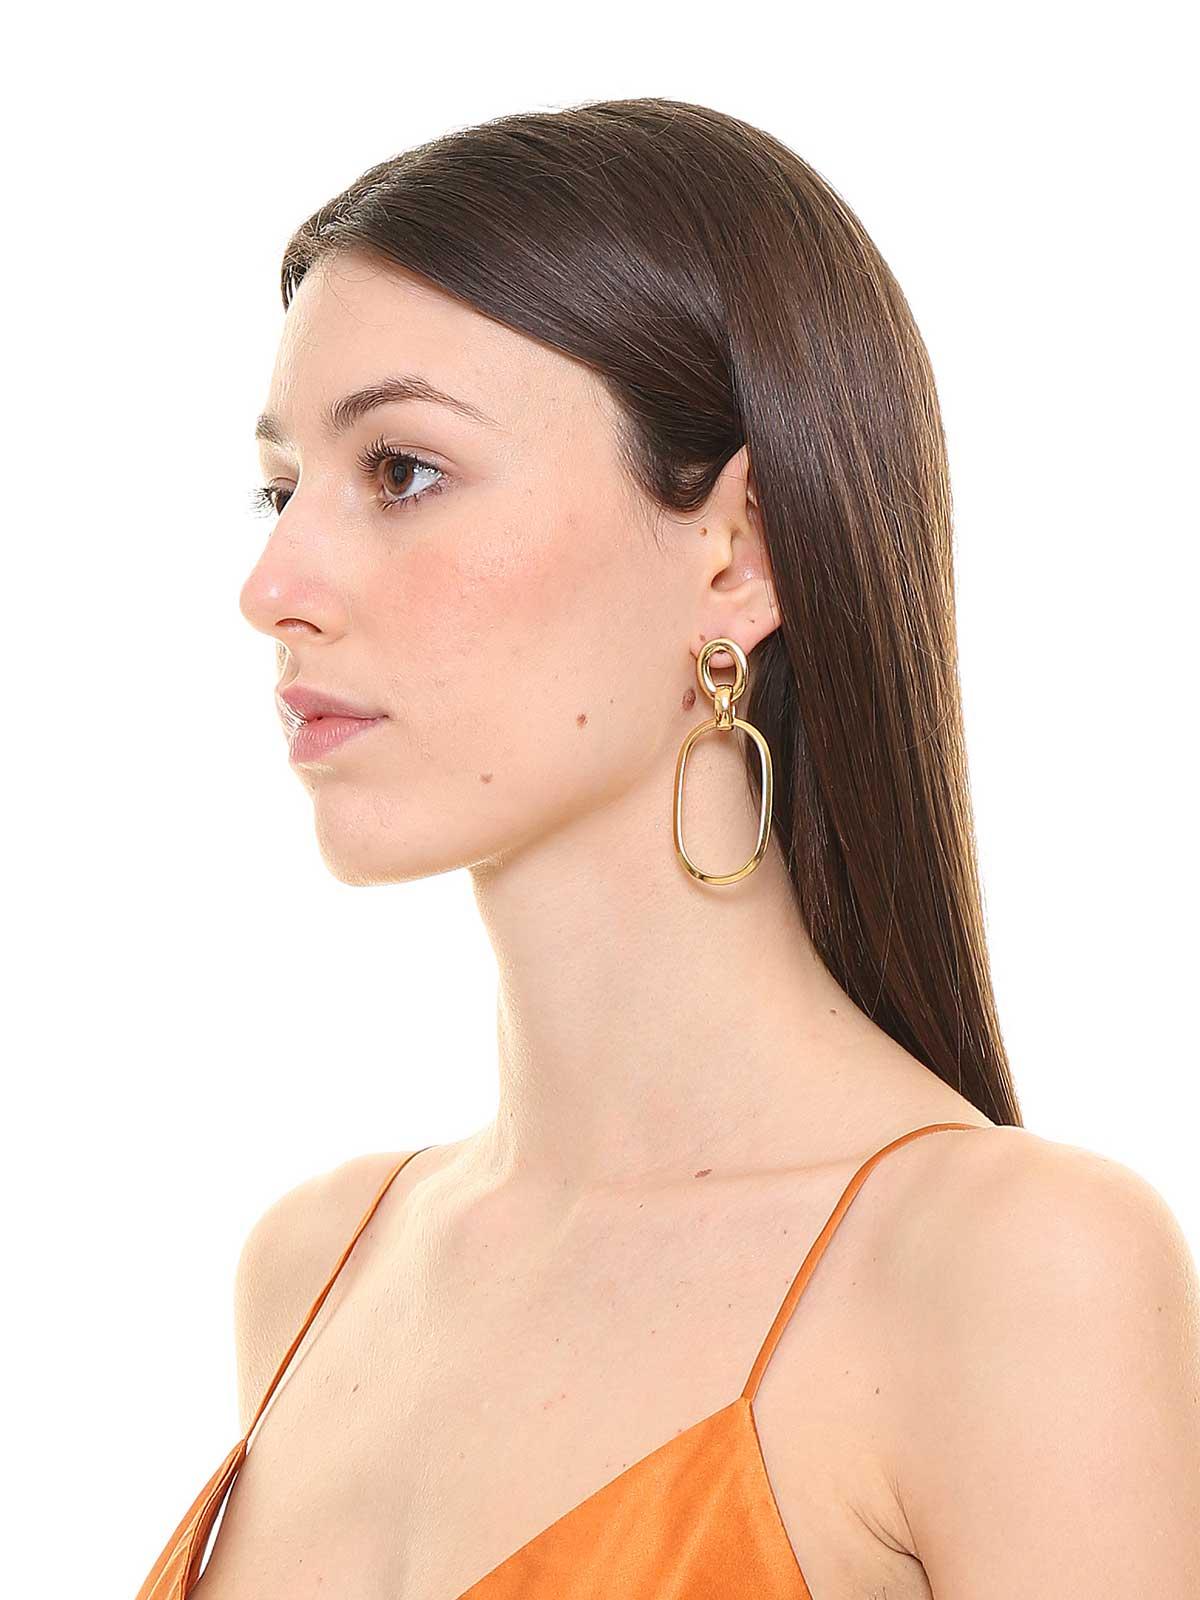 Pendent chain earrings